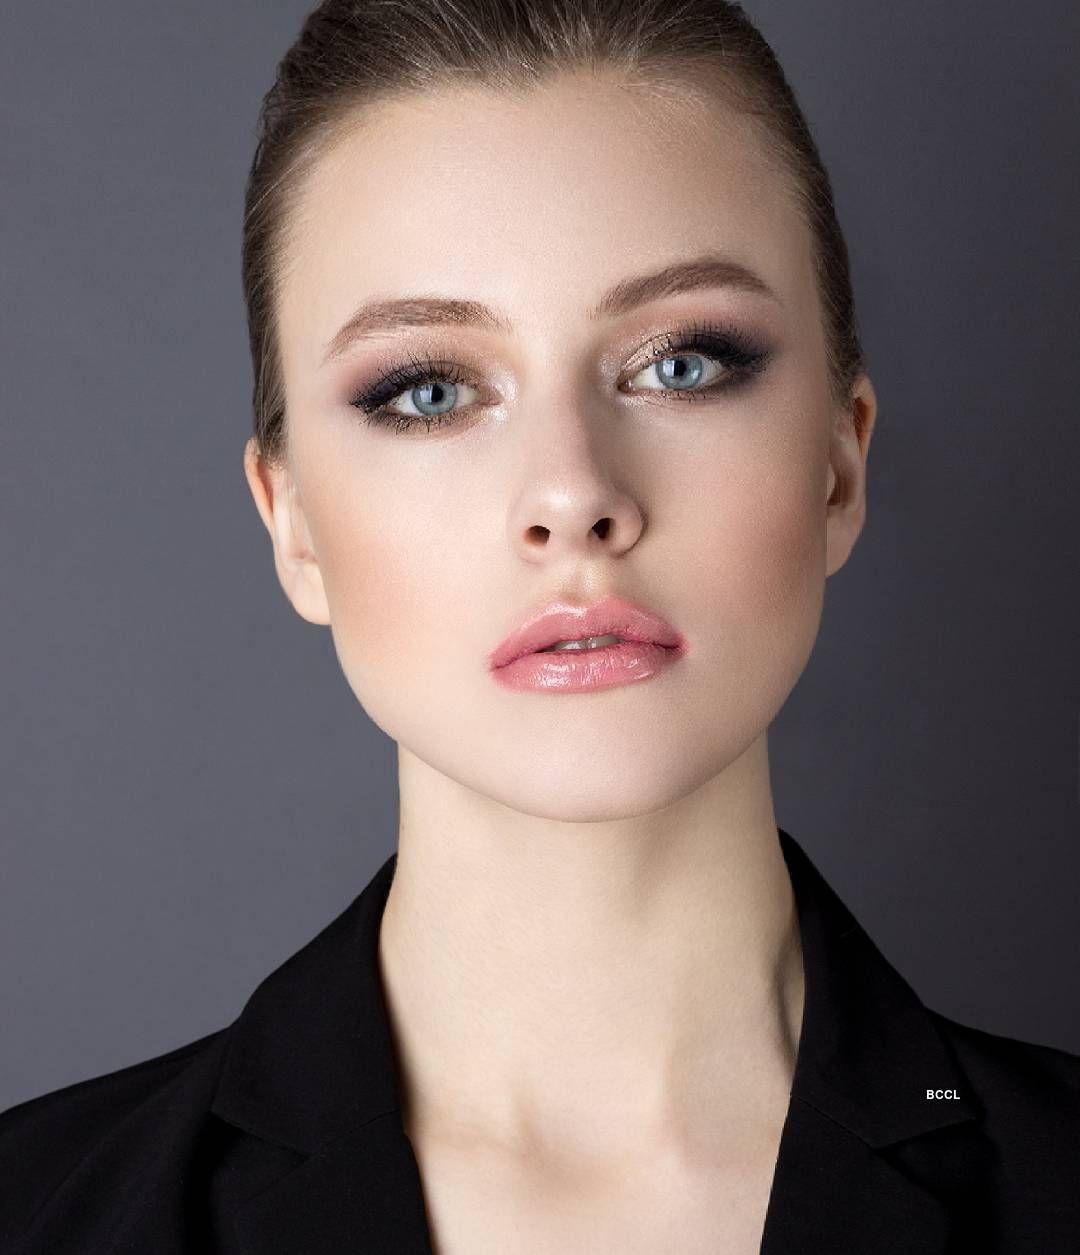 Gambarmemek Online Postimg Org Duo Sergei Naomi: Alina Nikitina&liinaliiis Masturbate